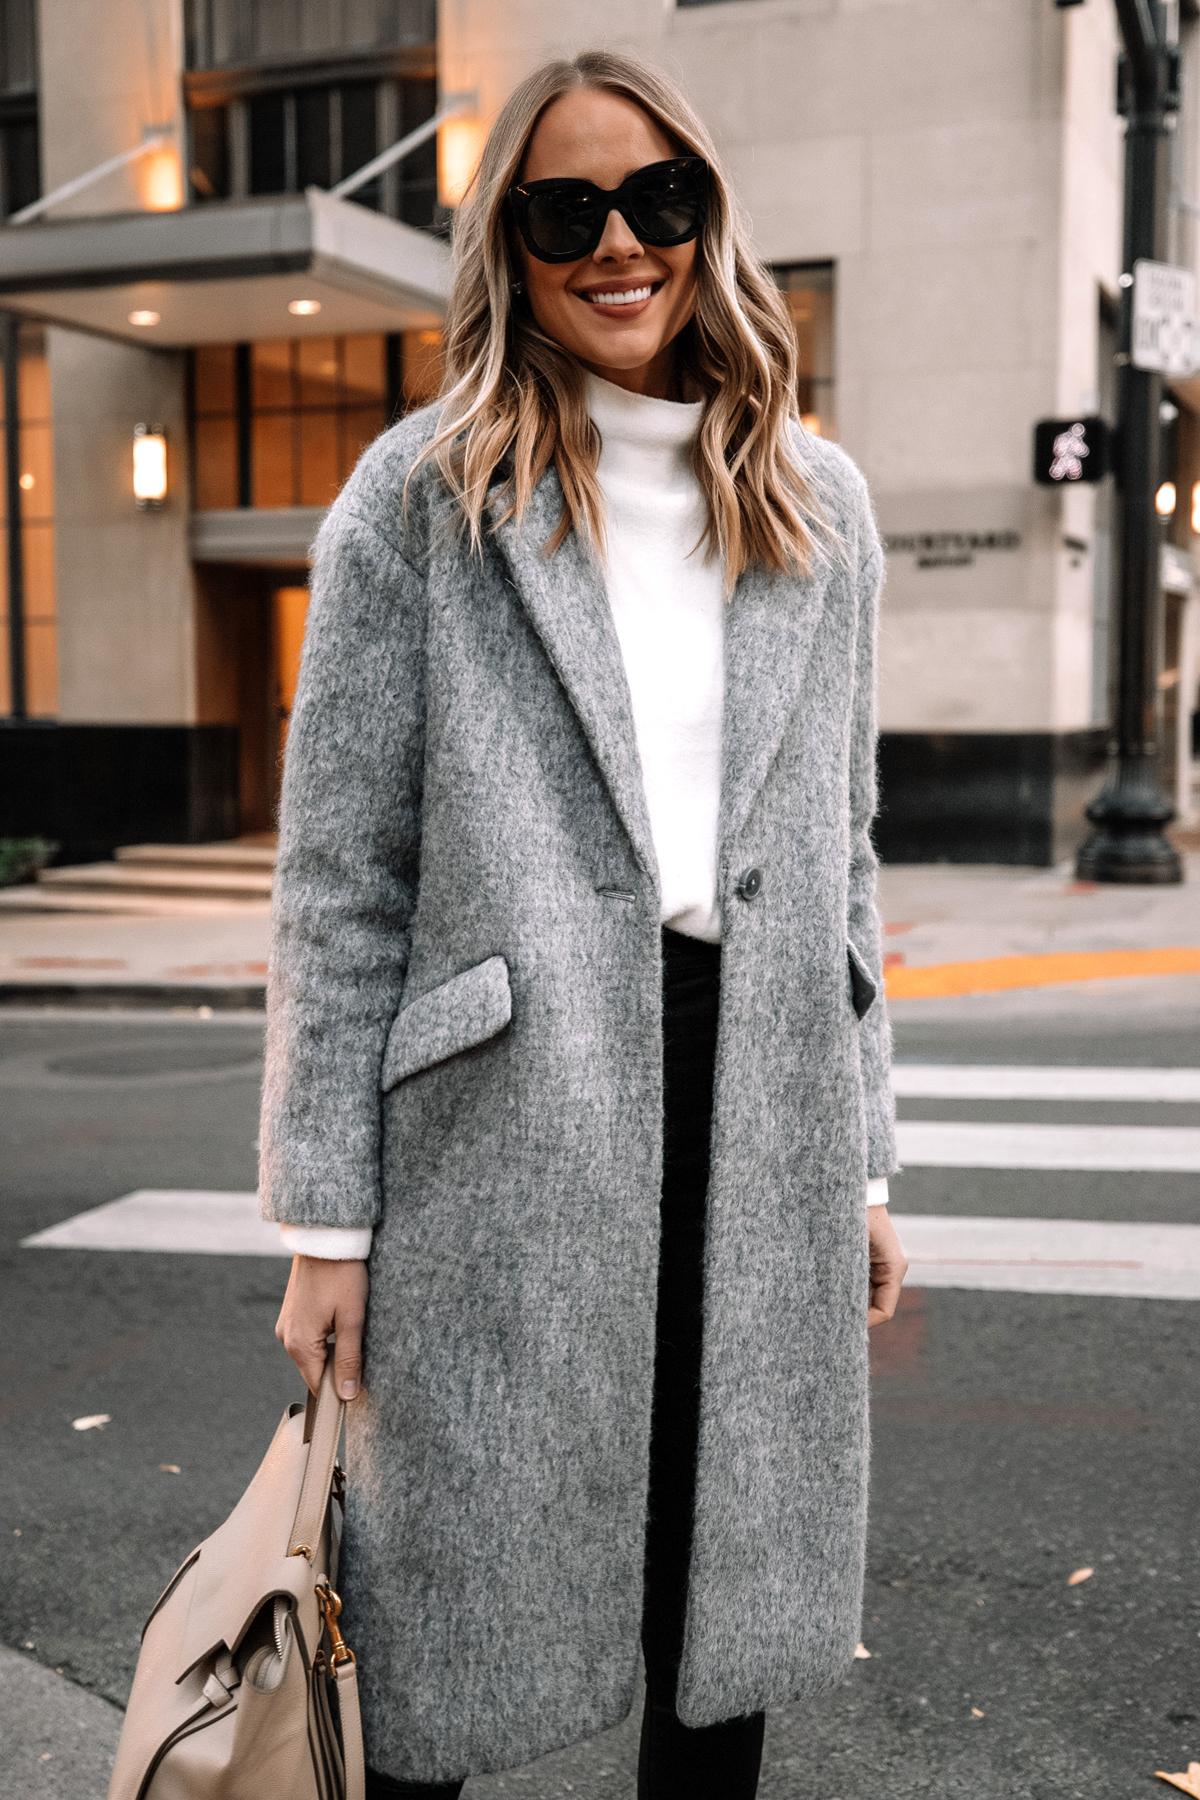 Fashion Jackson Wearing Express Long Grey Coat White Sweater Winter Outfit